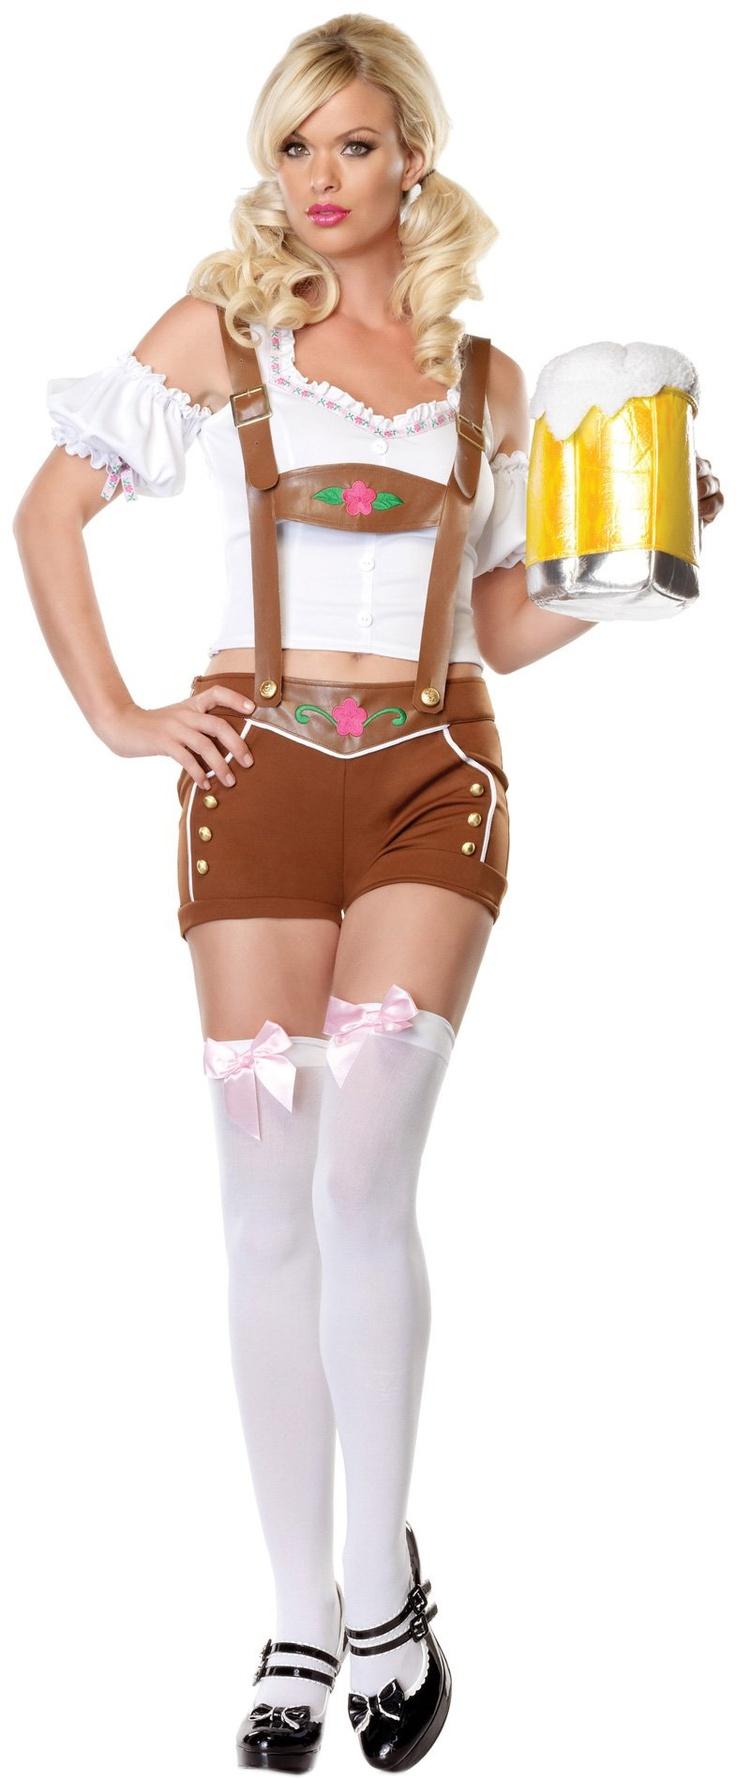 Little Miss Lederhosen Costume, Leg Avenue - Sexy Oktoberfest costume perfect for Valentine's Day.